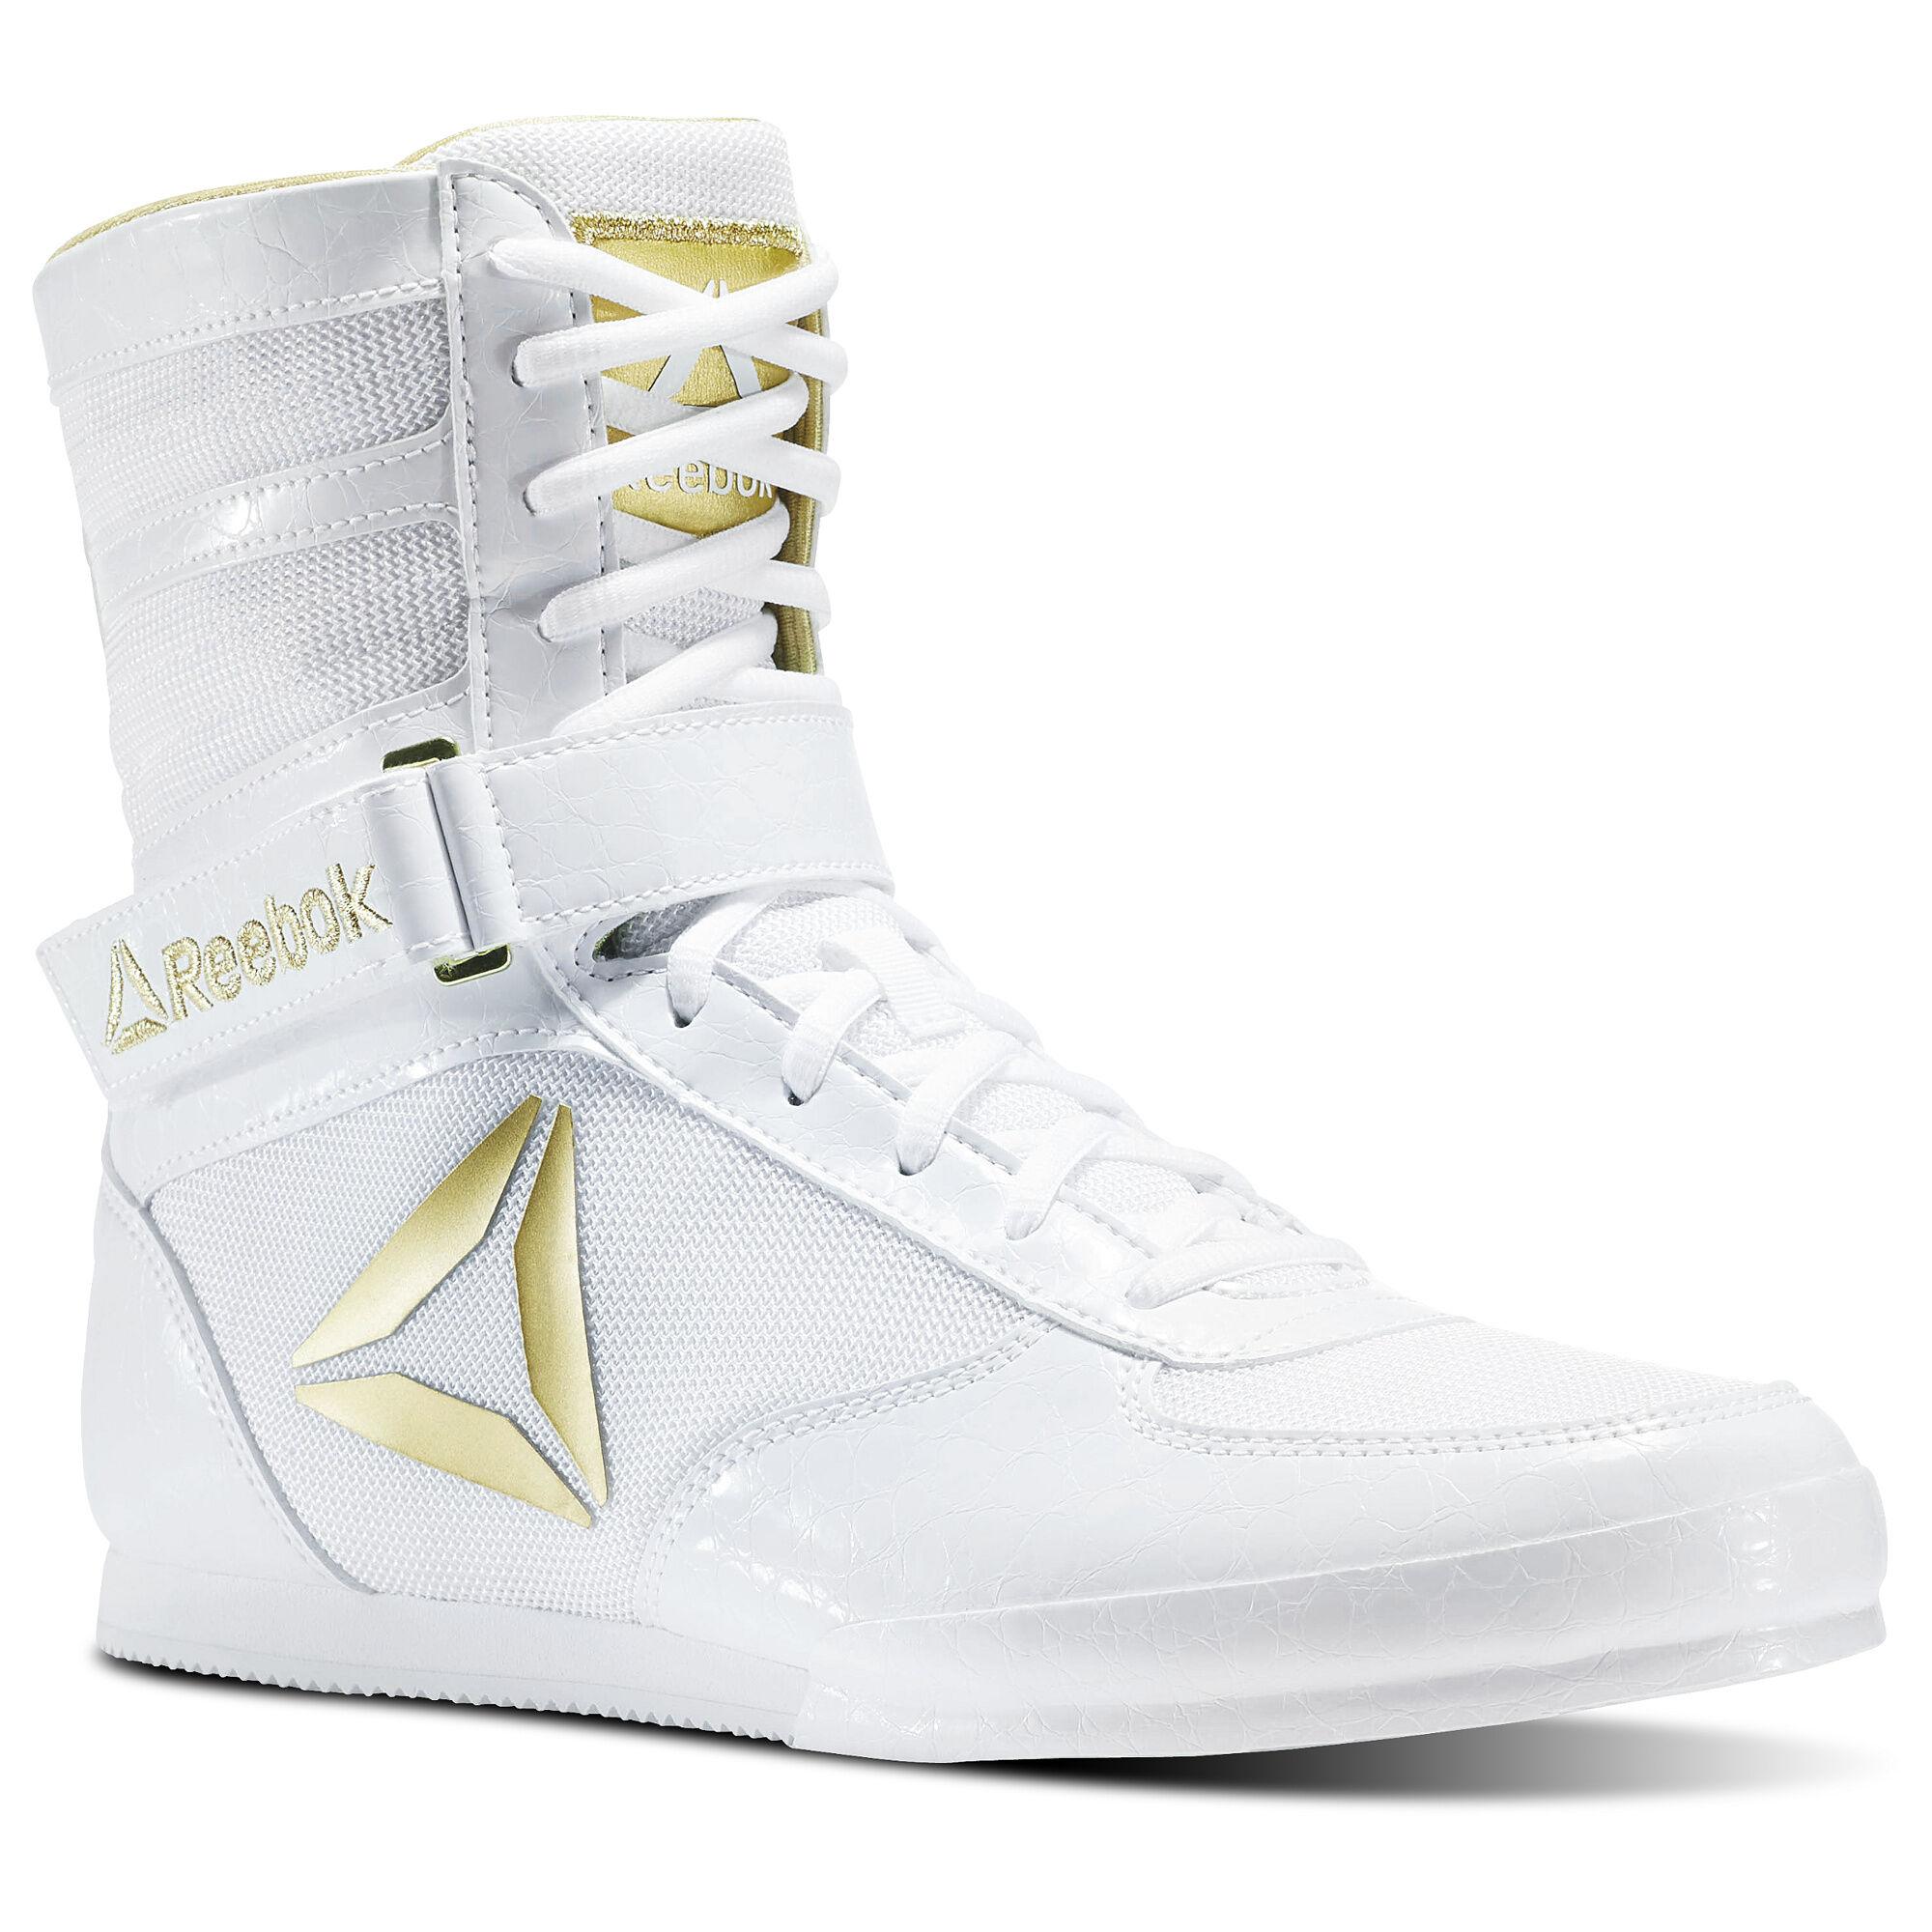 fab8d67e24adab Reebok Boxing Boots - White